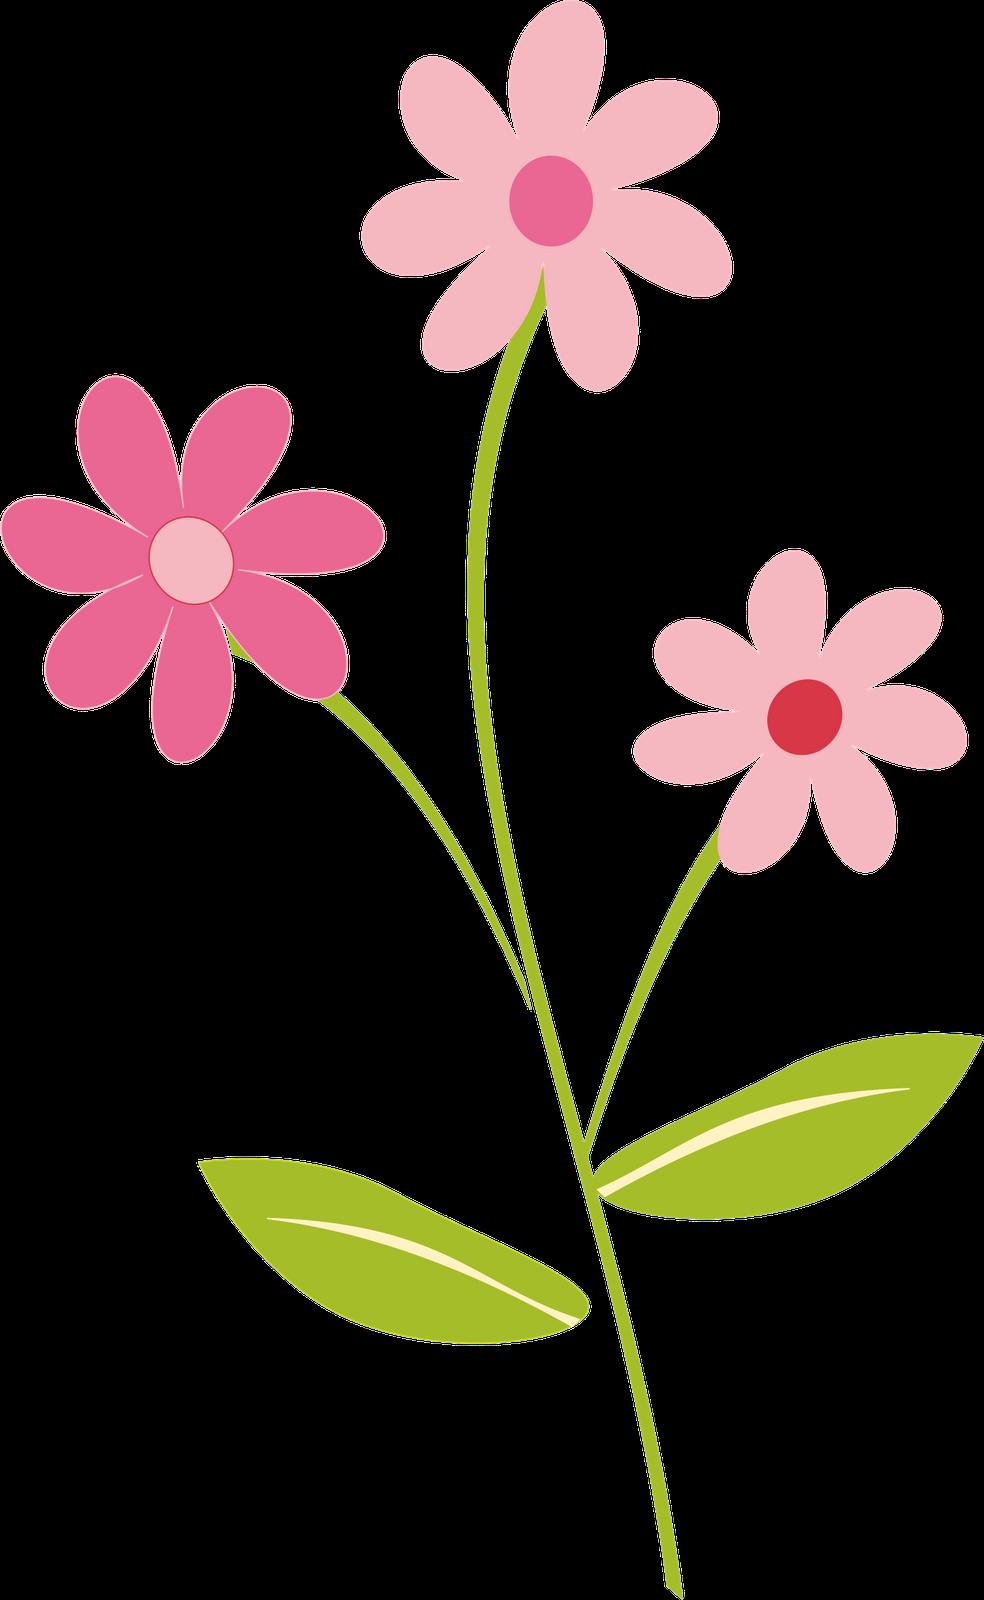 Flowers border png pictures. Floral clipart fuschia